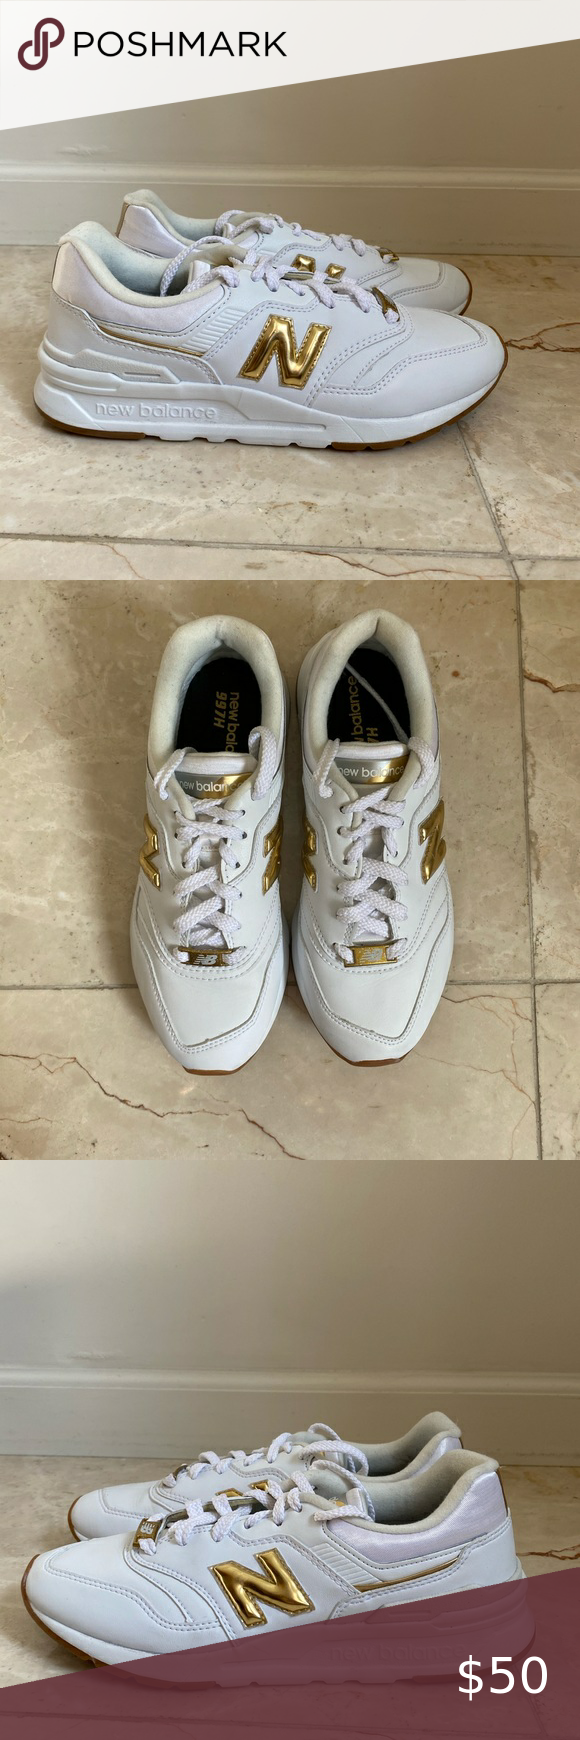 New Balance 997H gold \u0026 white sneakers